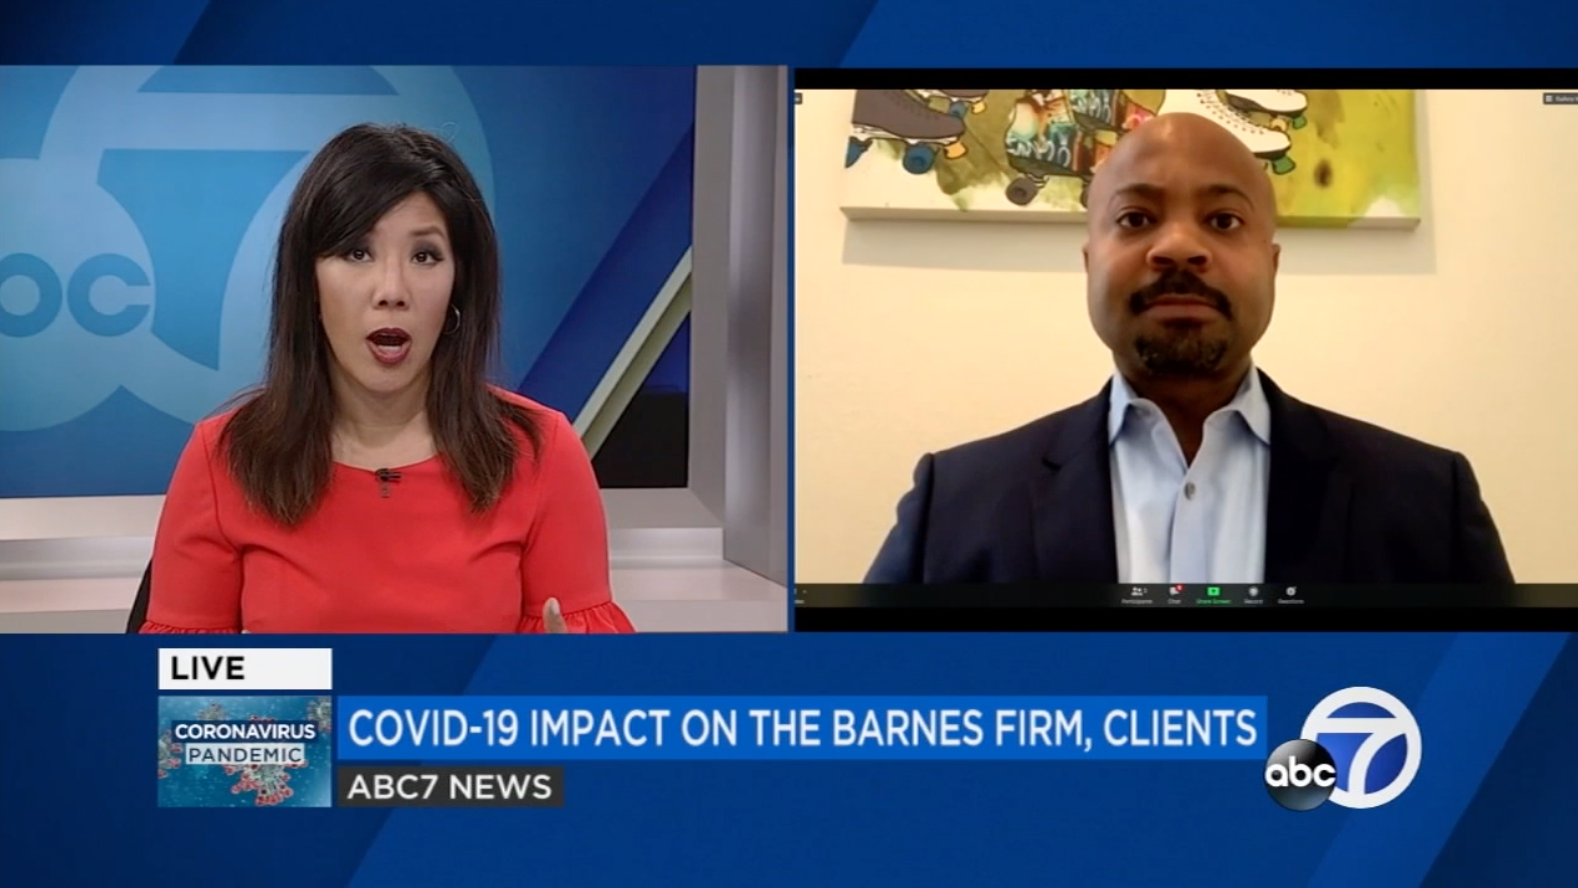 Landon Vivian ABC News The Barnes Firm COVID